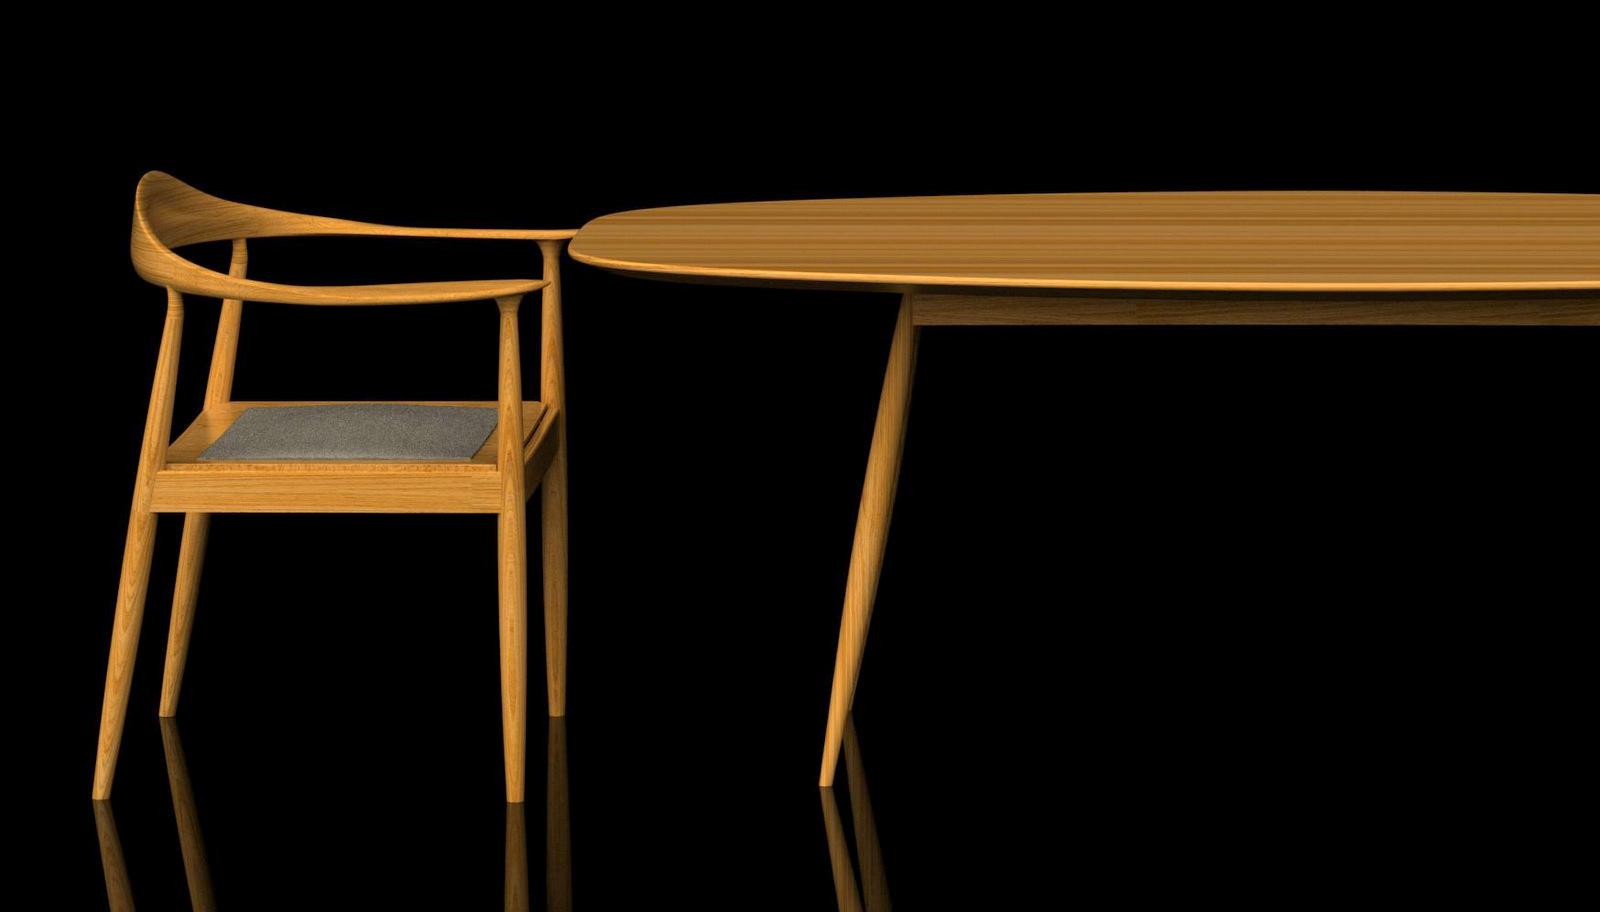 1-moualla-table031